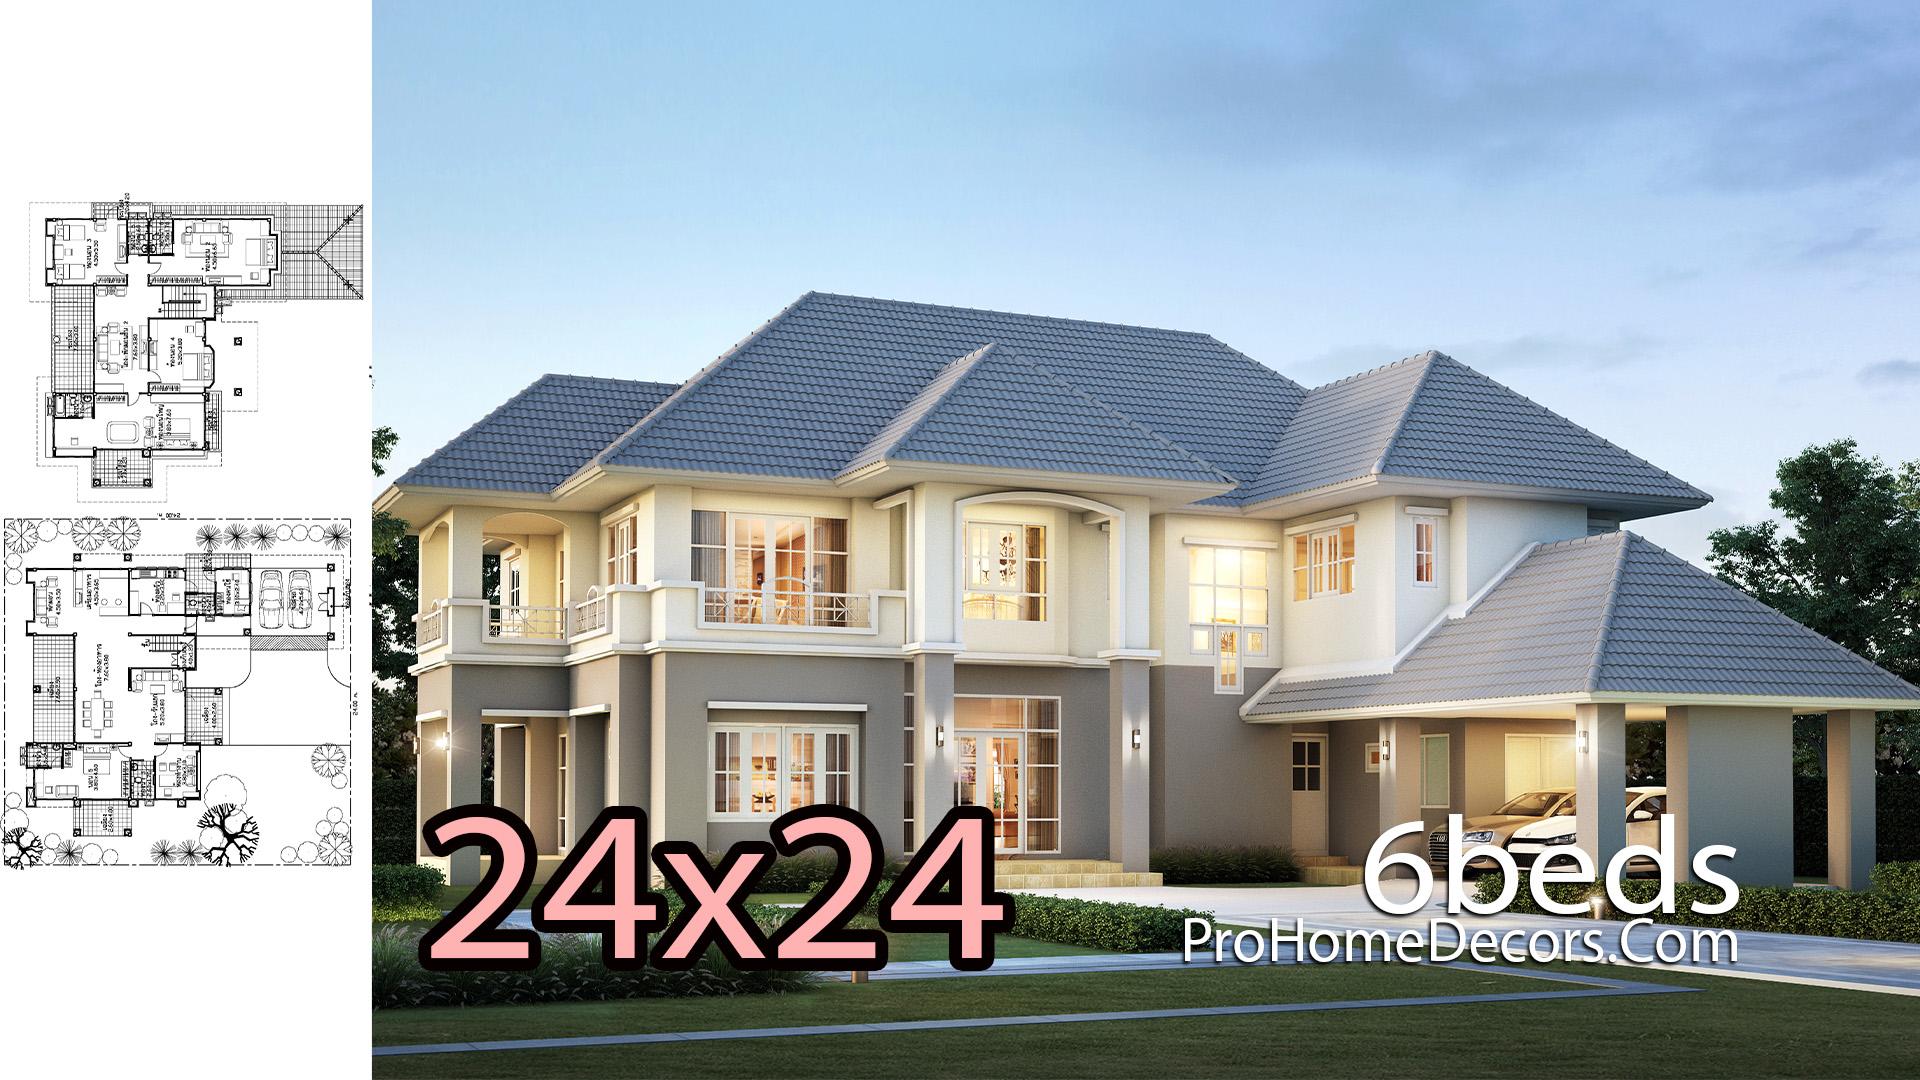 6 Bedrooms House Plan Plot 24x24 meters